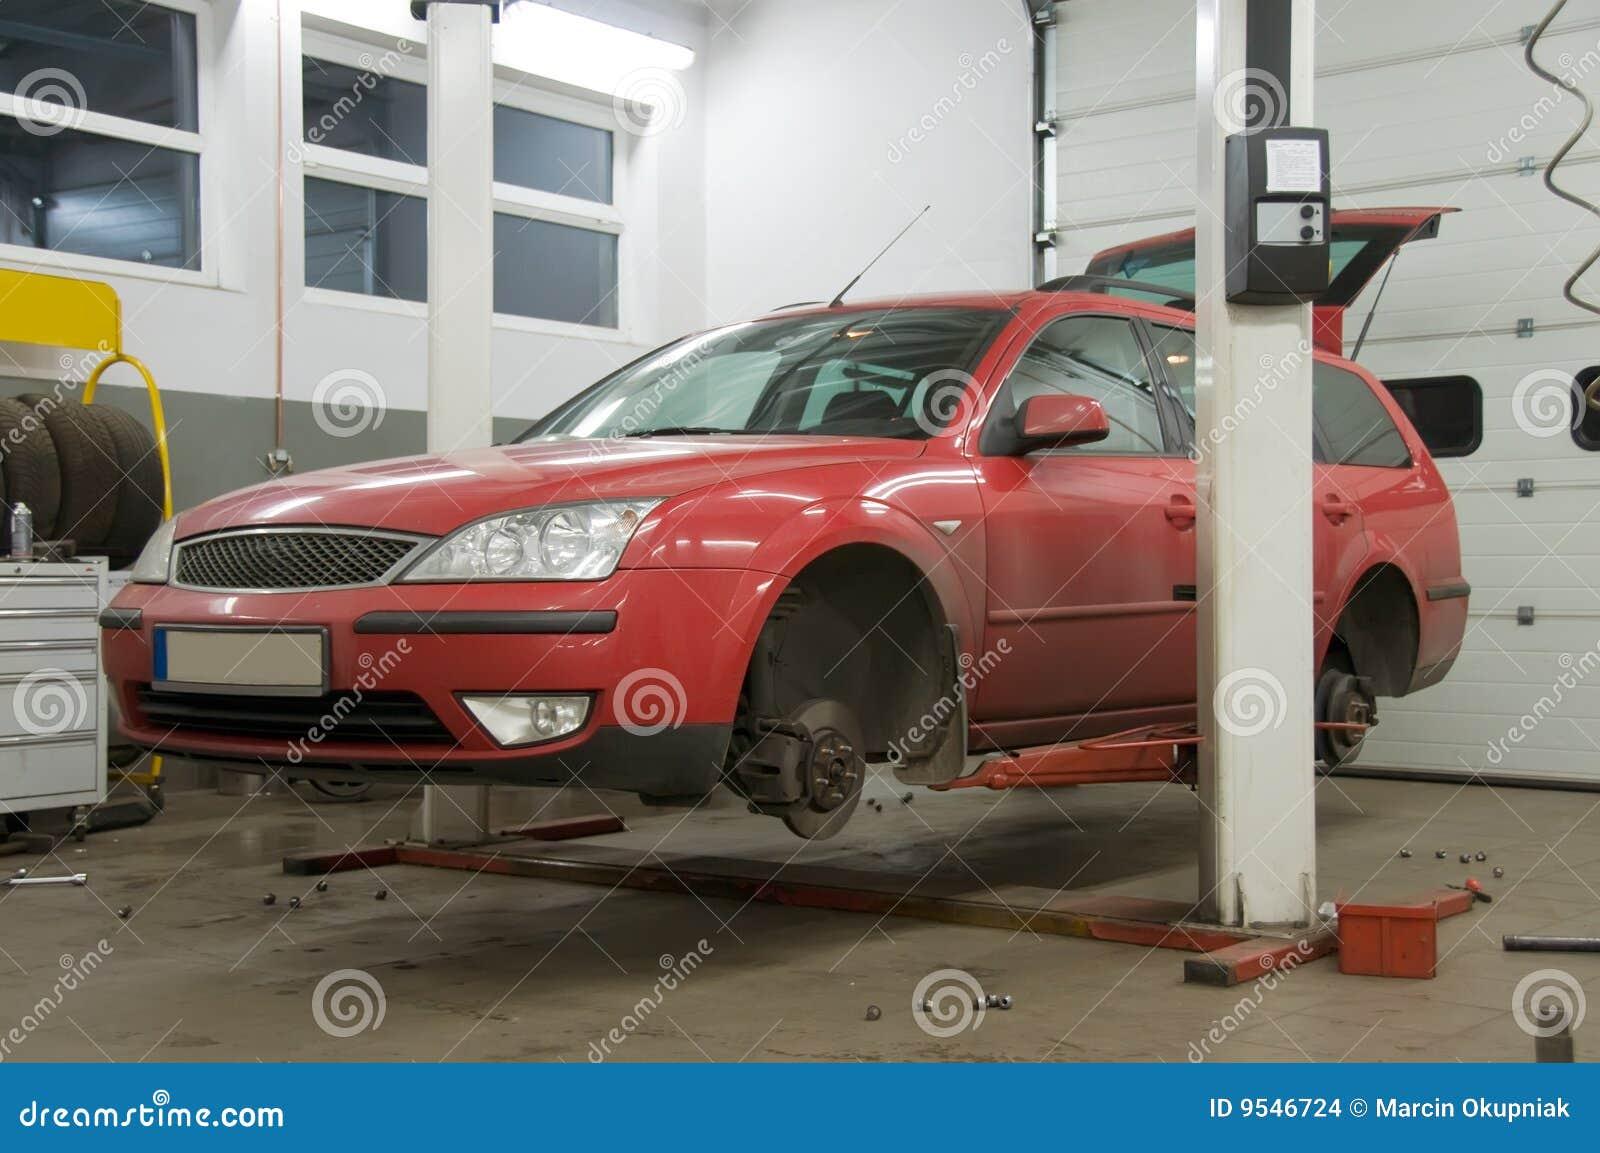 Red car on raiser